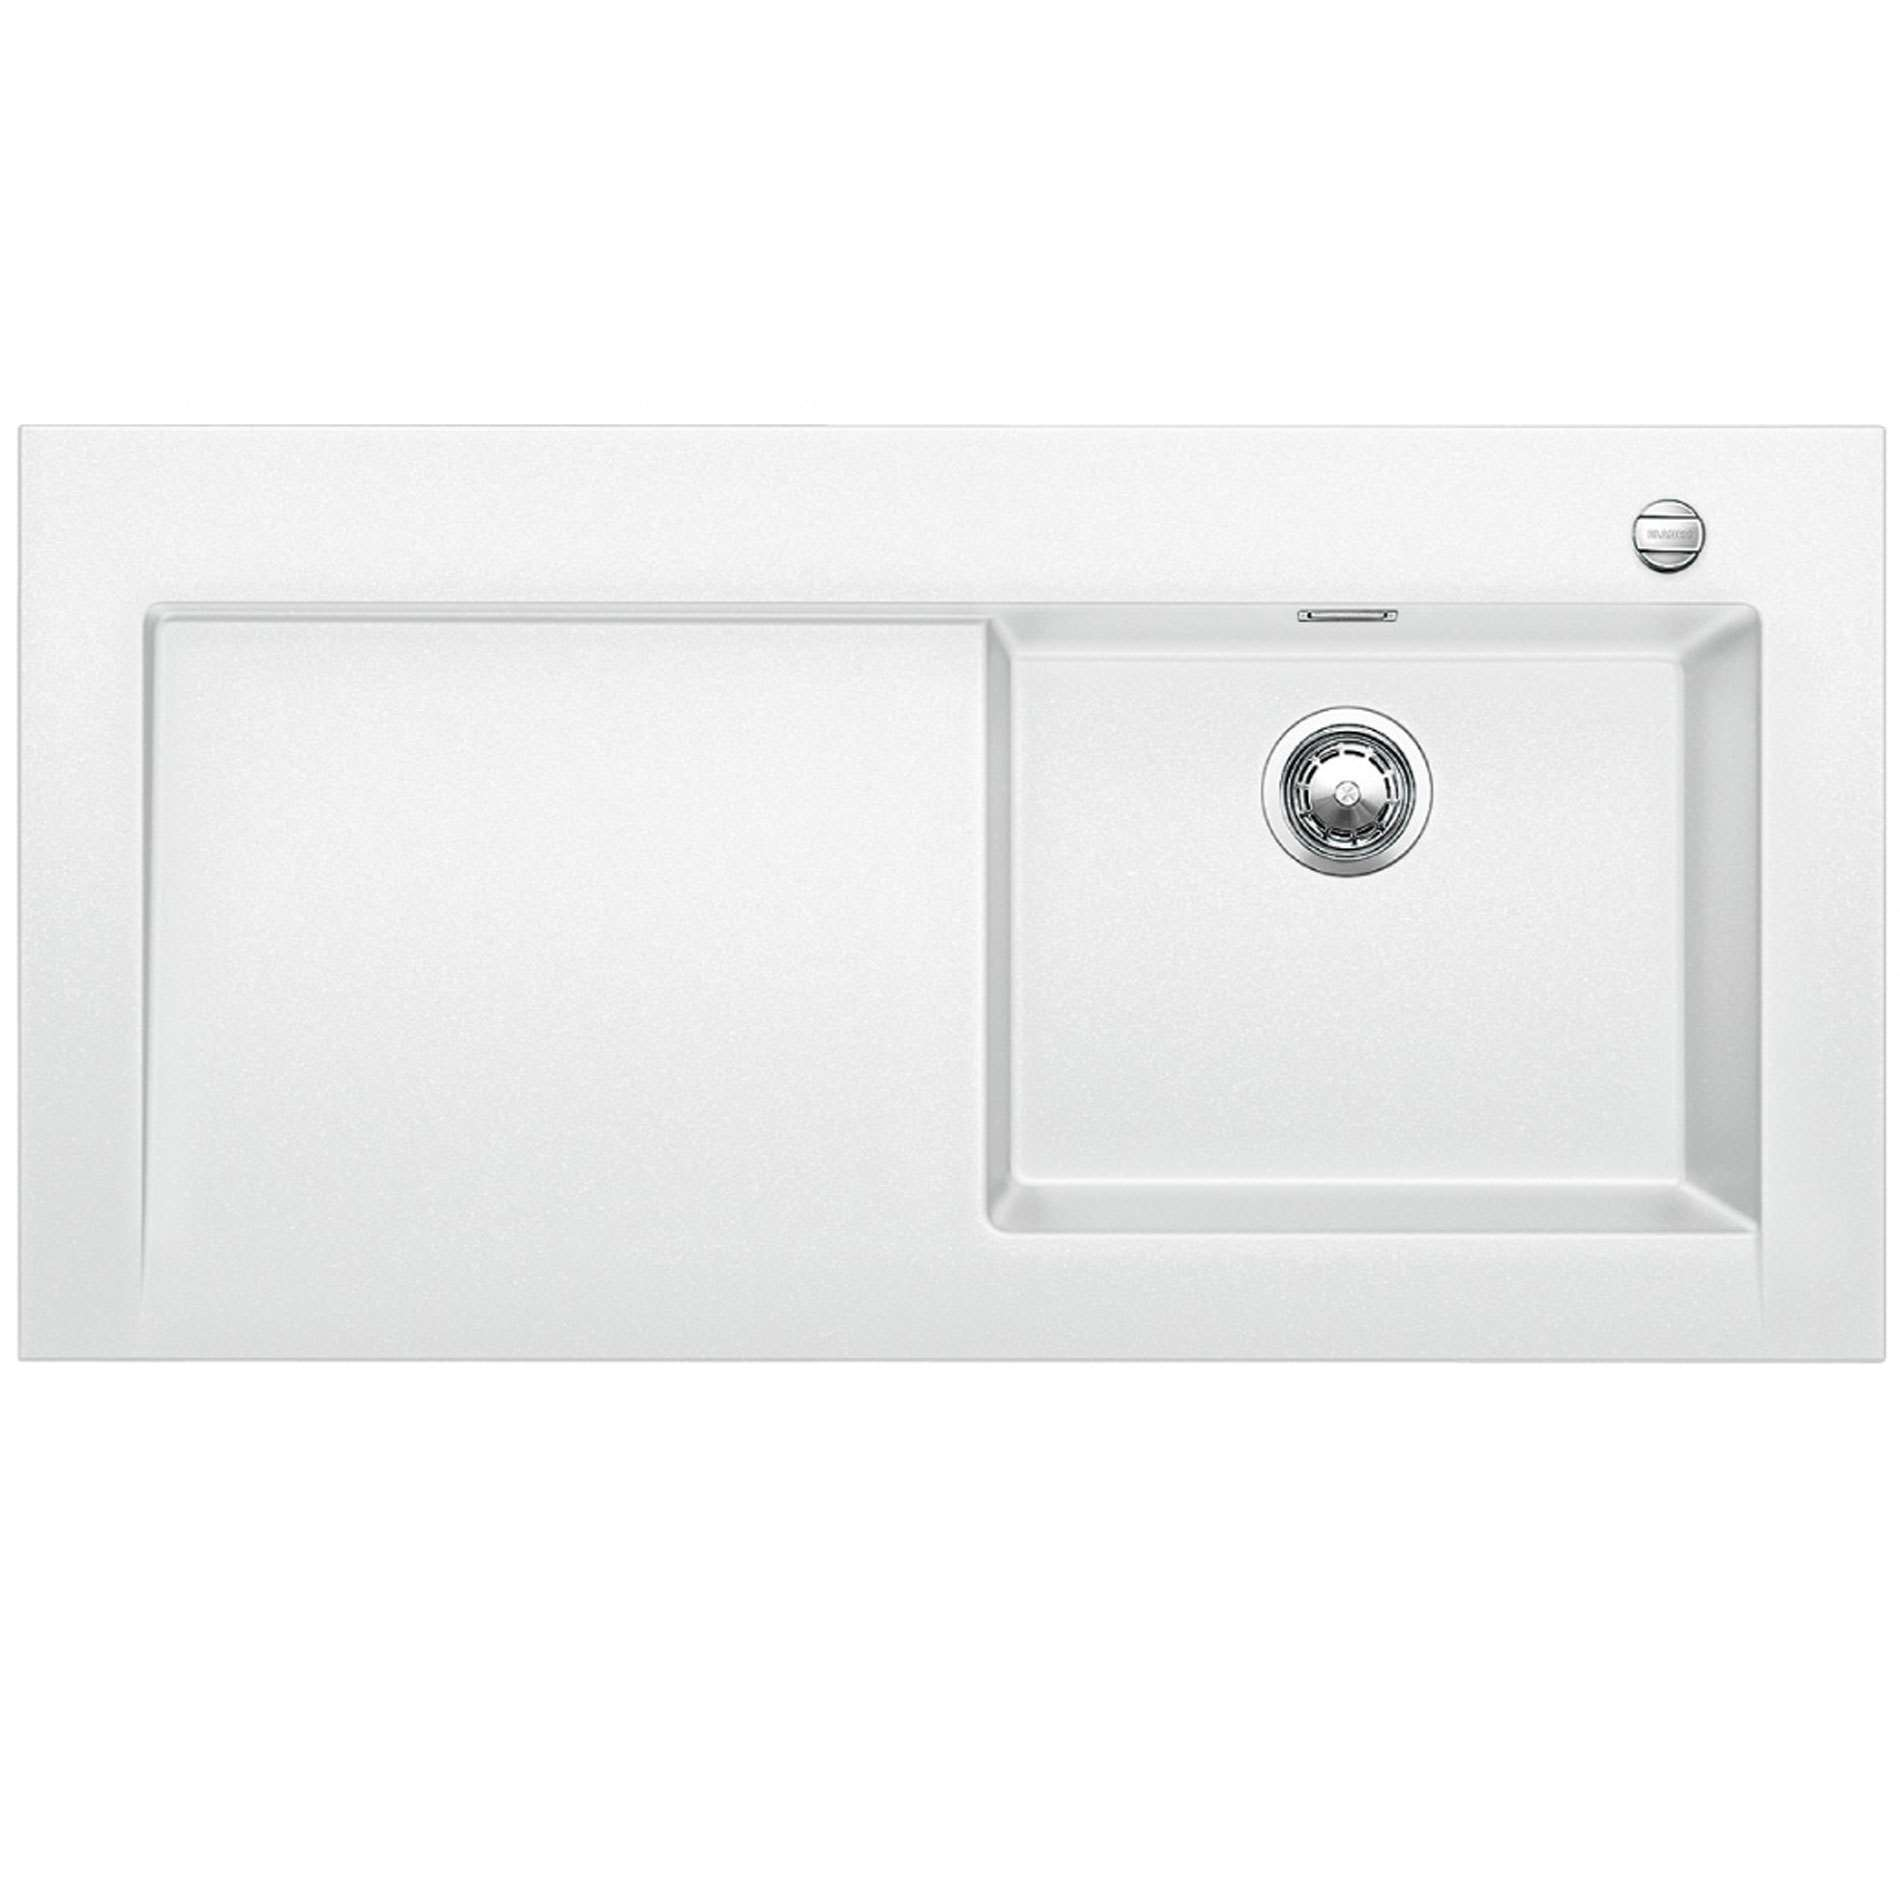 Blanco Silgranit White : Blanco: Modex M-60 White Silgranit Sink - Kitchen Sinks & Taps